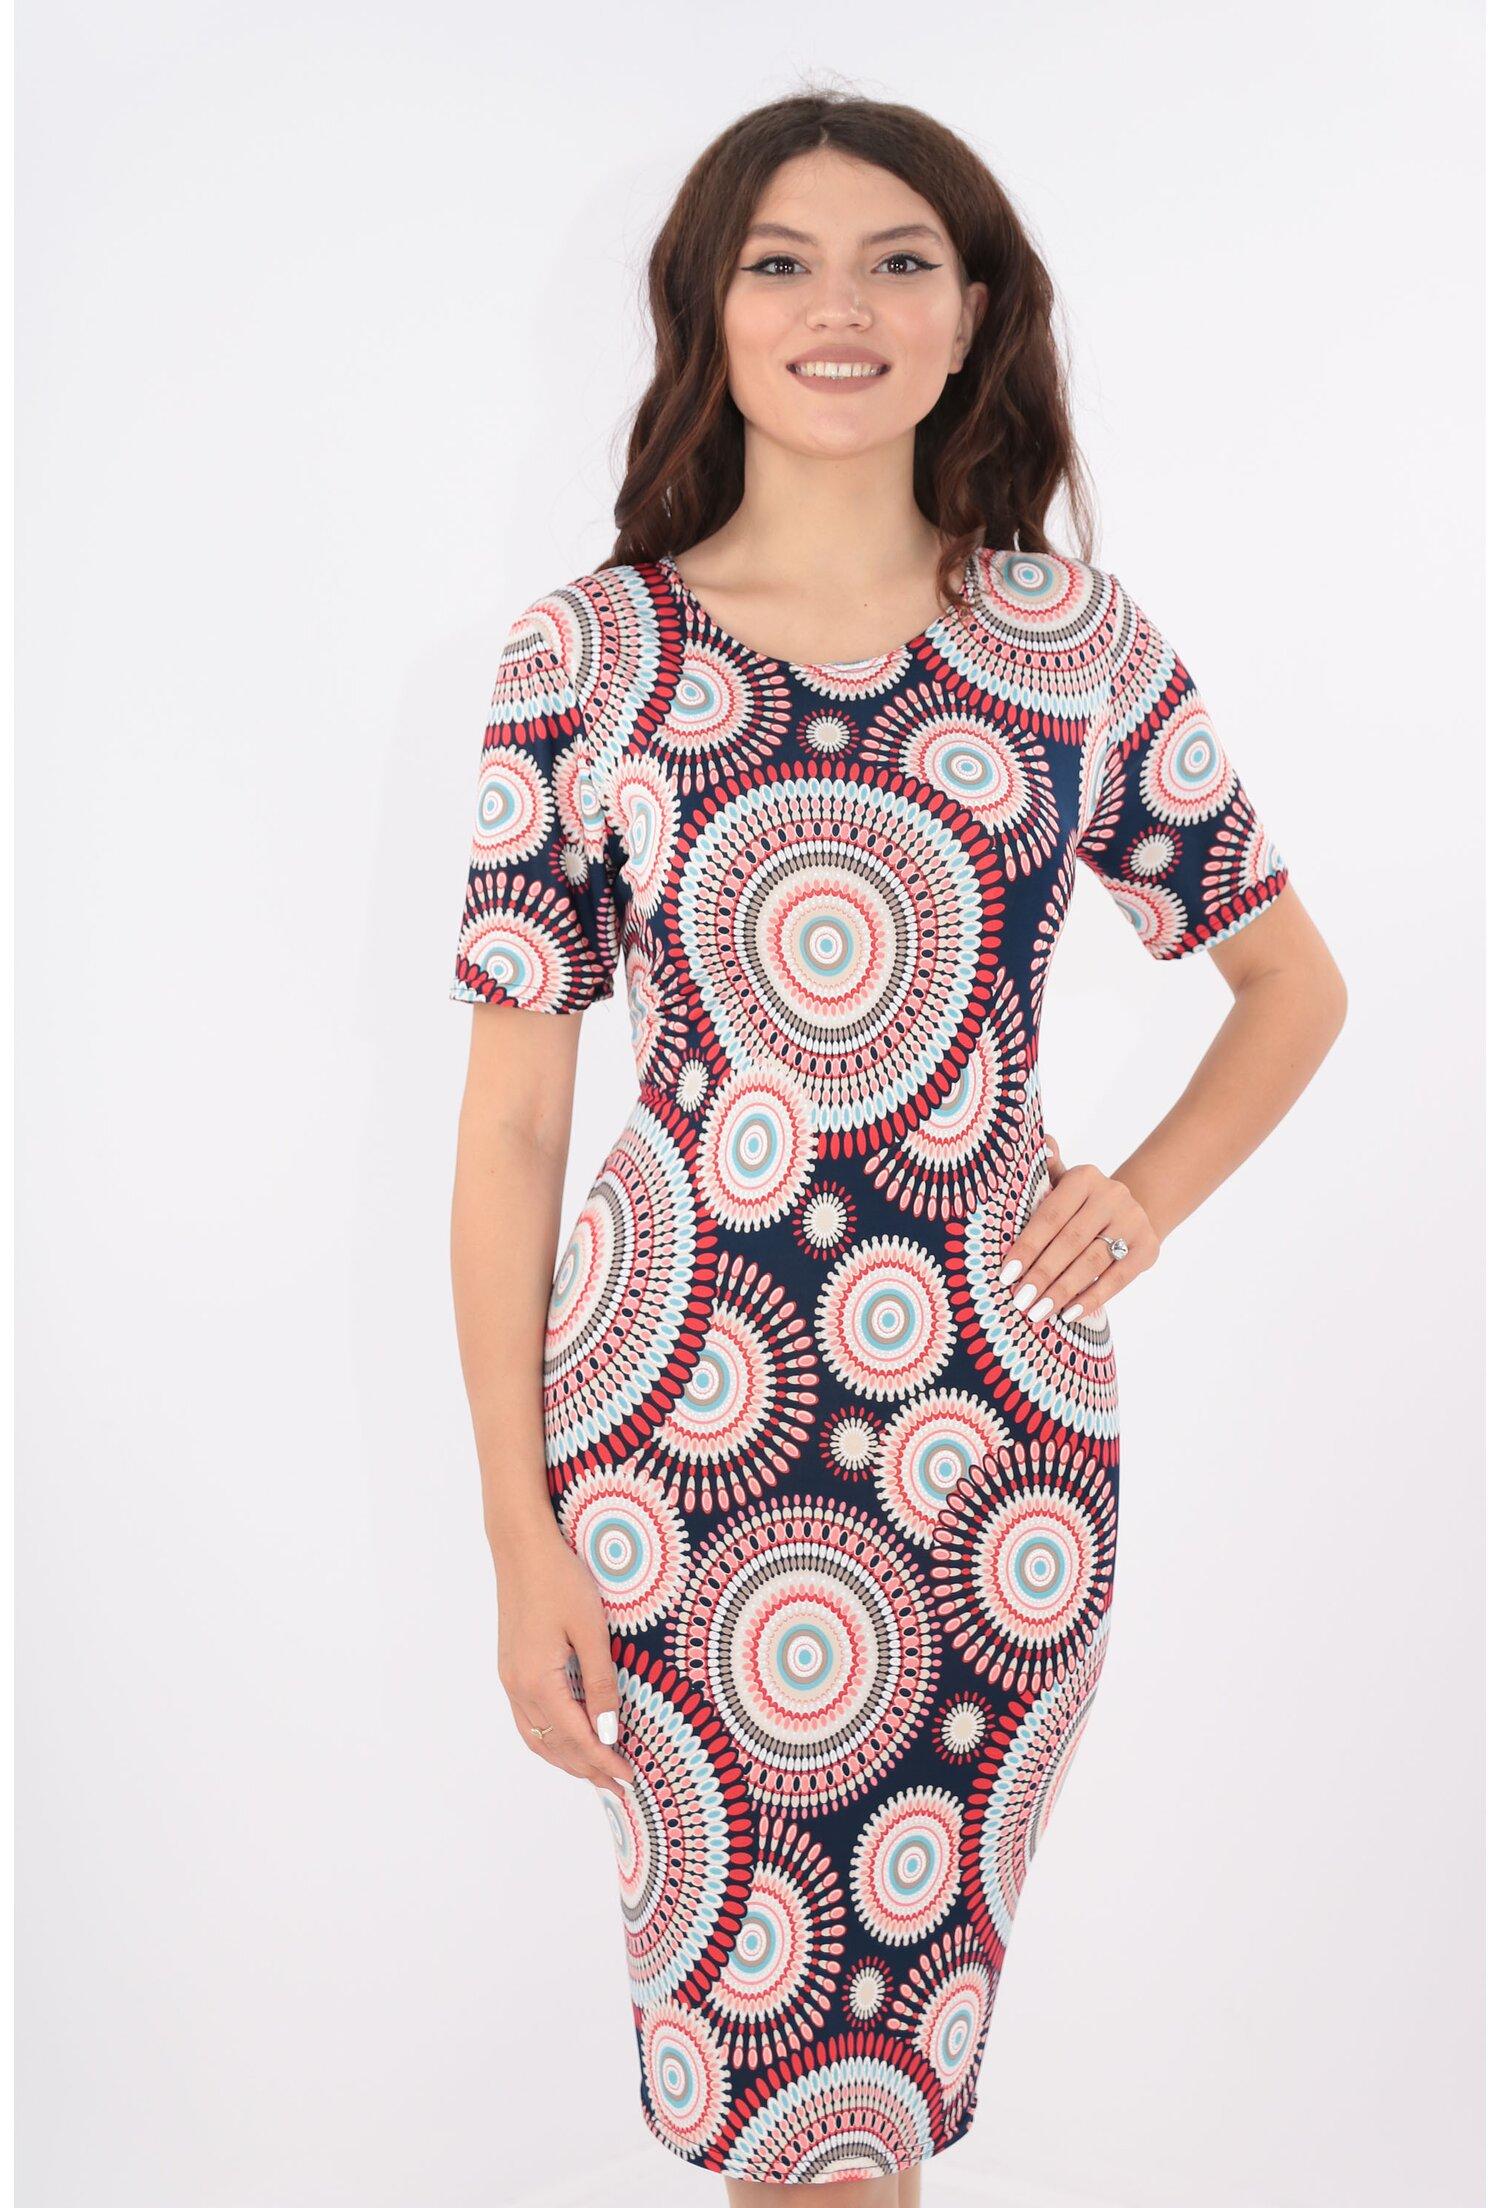 Rochie bleumarin cu cercuri multicolore